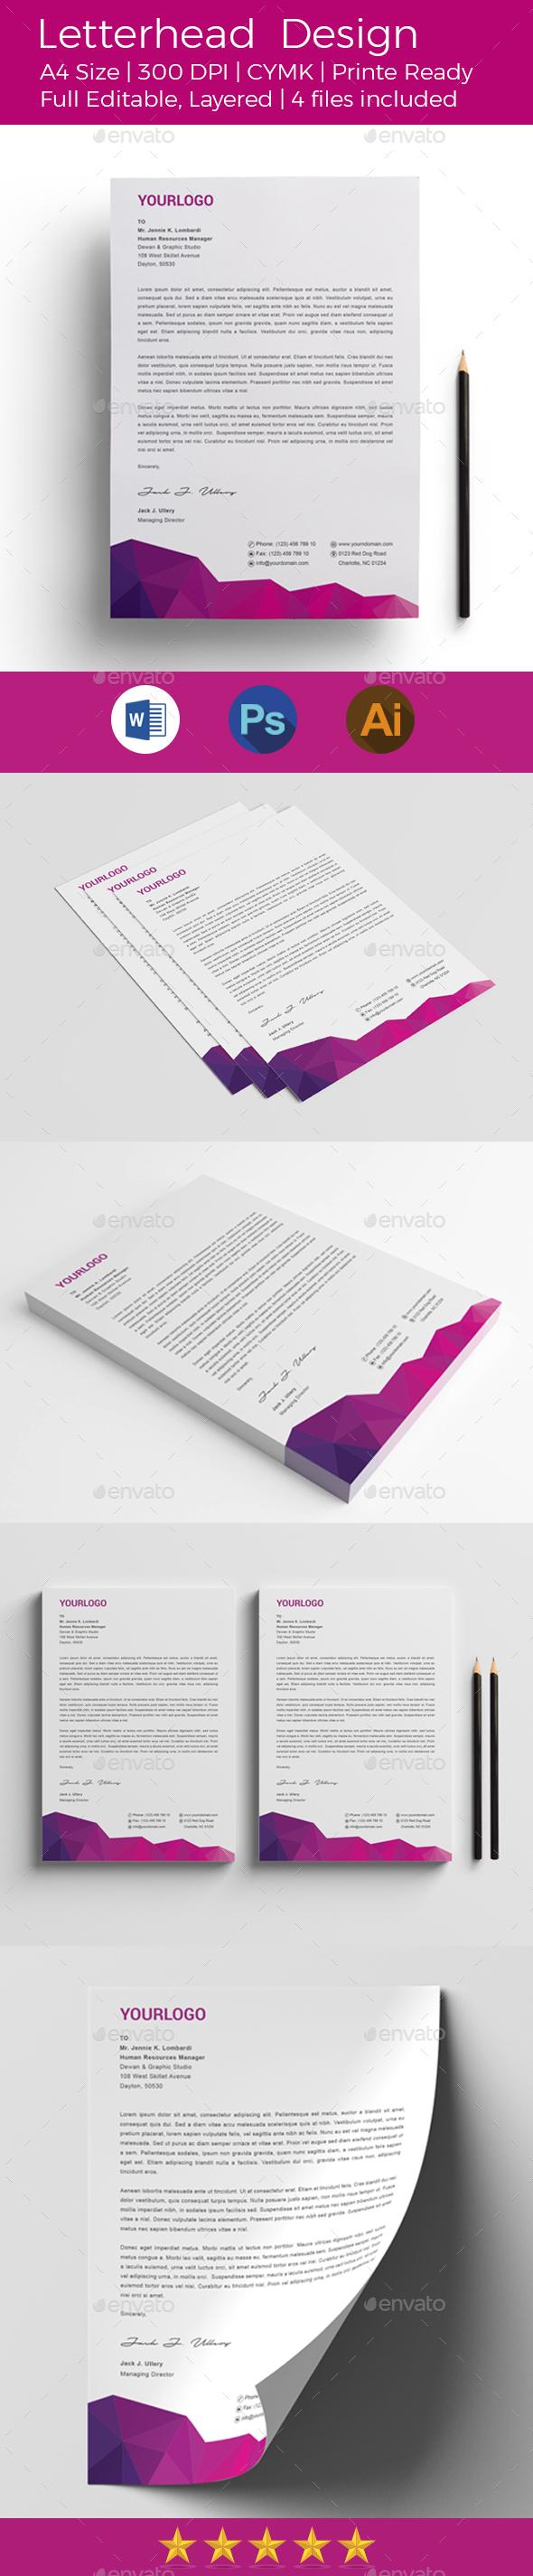 Letterhead Design - Stationery Print